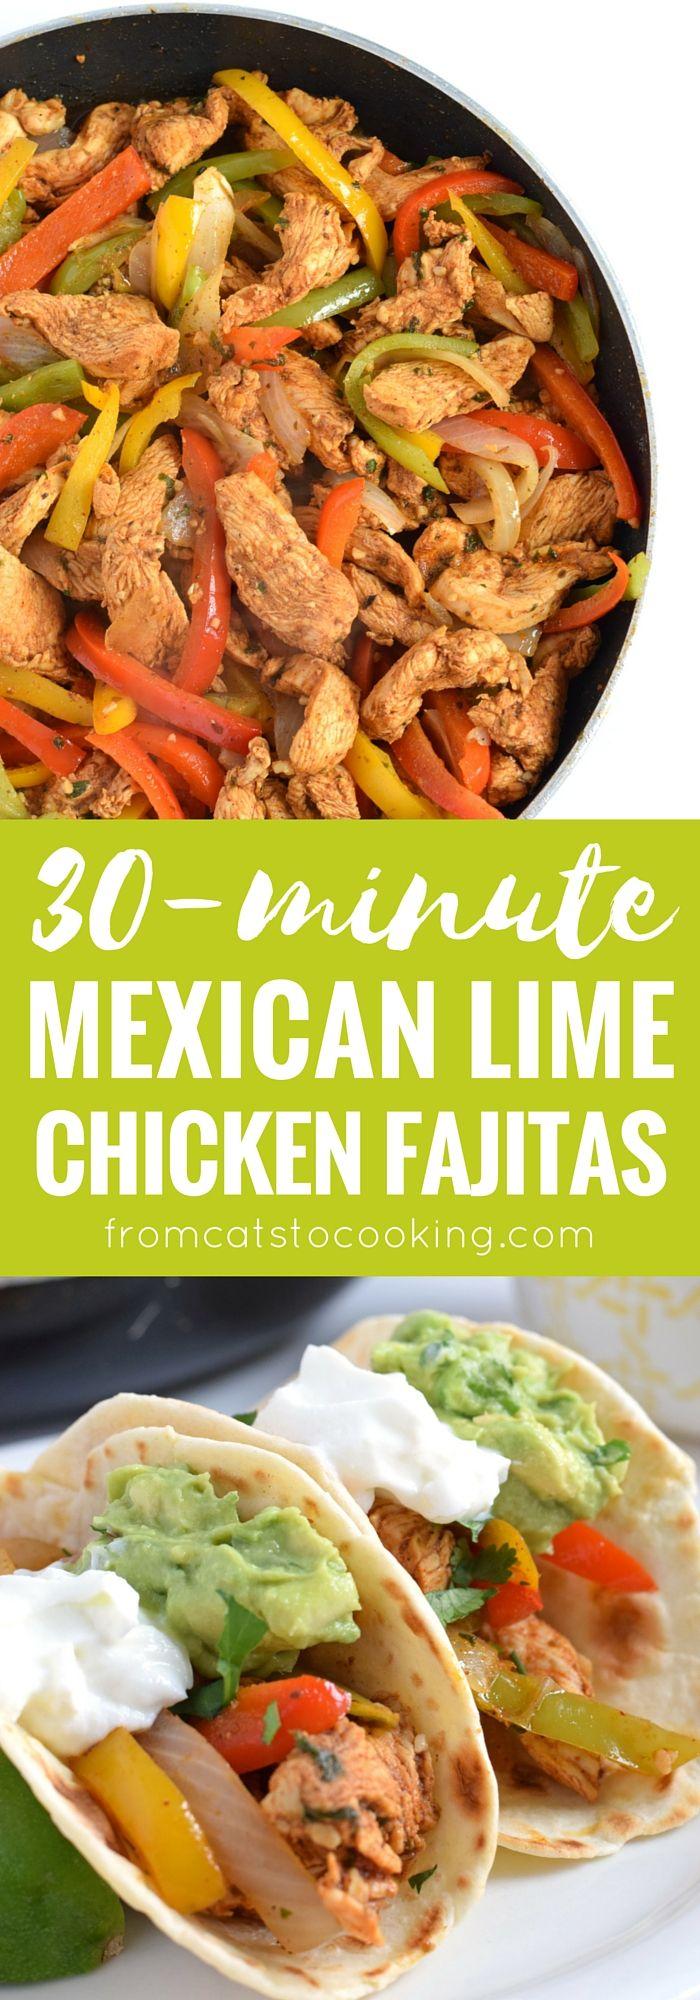 30 Minute Mexican Lime Chicken Fajitas + Easy Guacamole